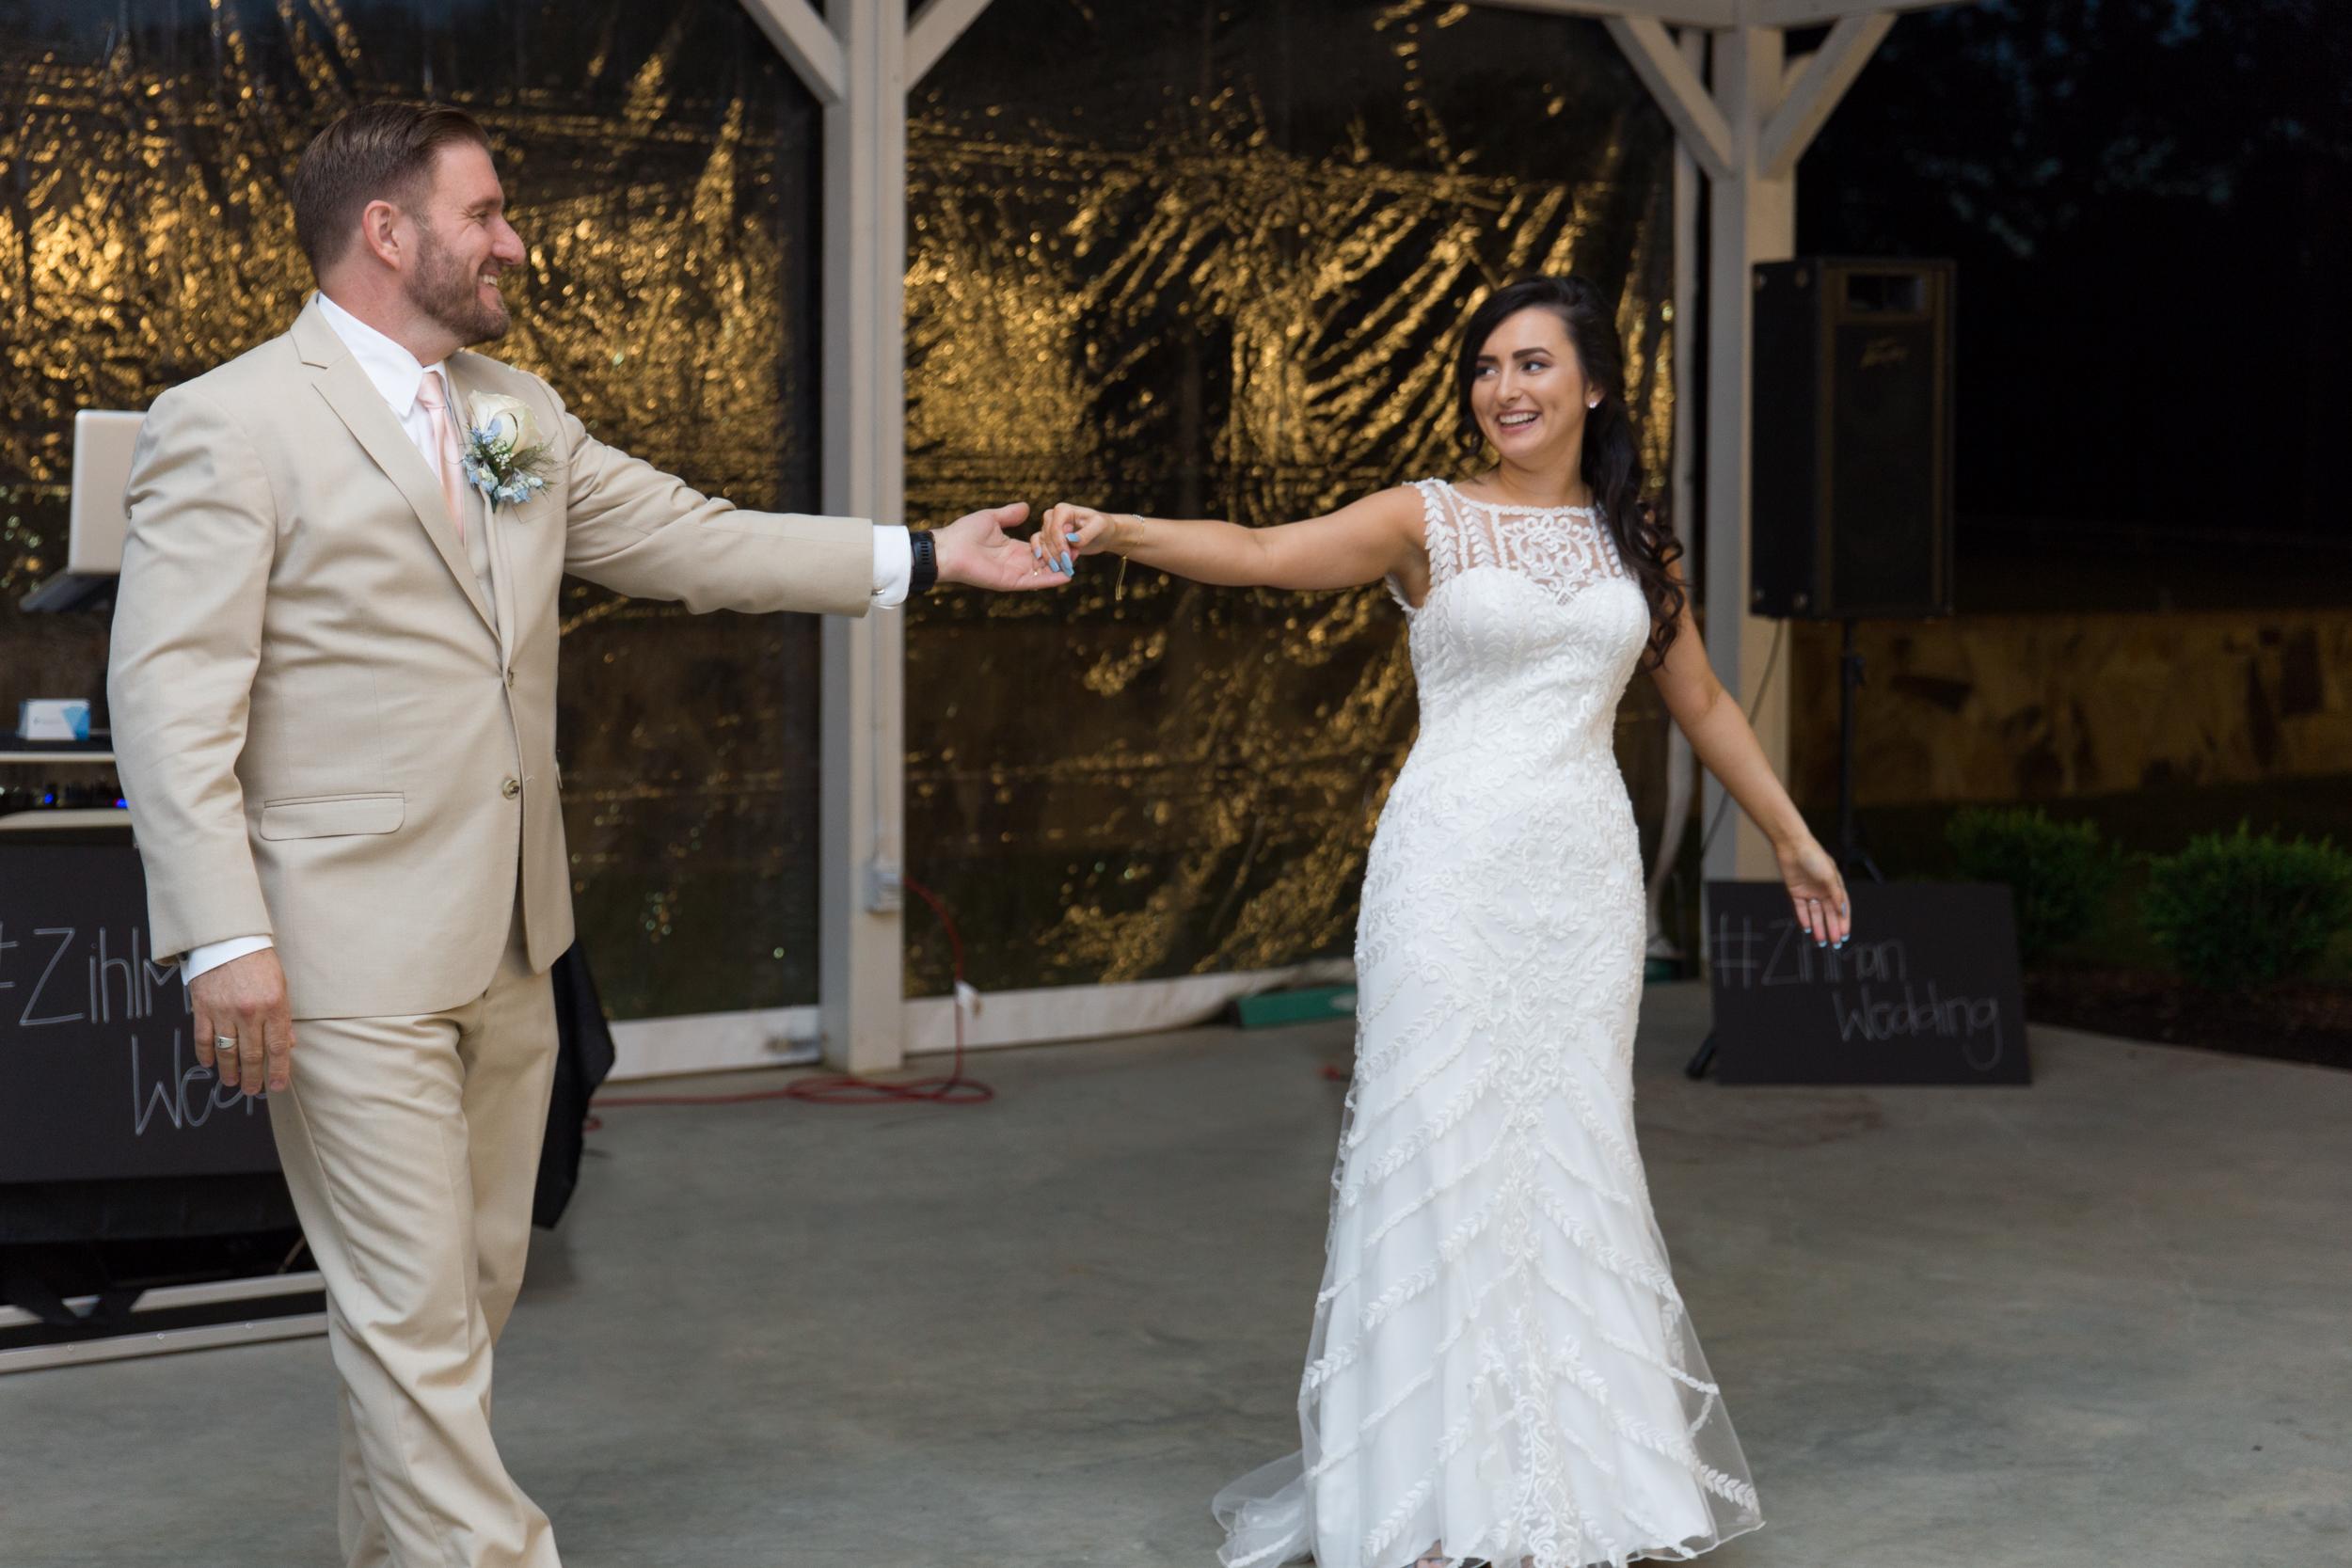 Zihlman-East TX Wedding_Kelsie Hendricks Photography_The Folmar Tyler Texas-41.jpg